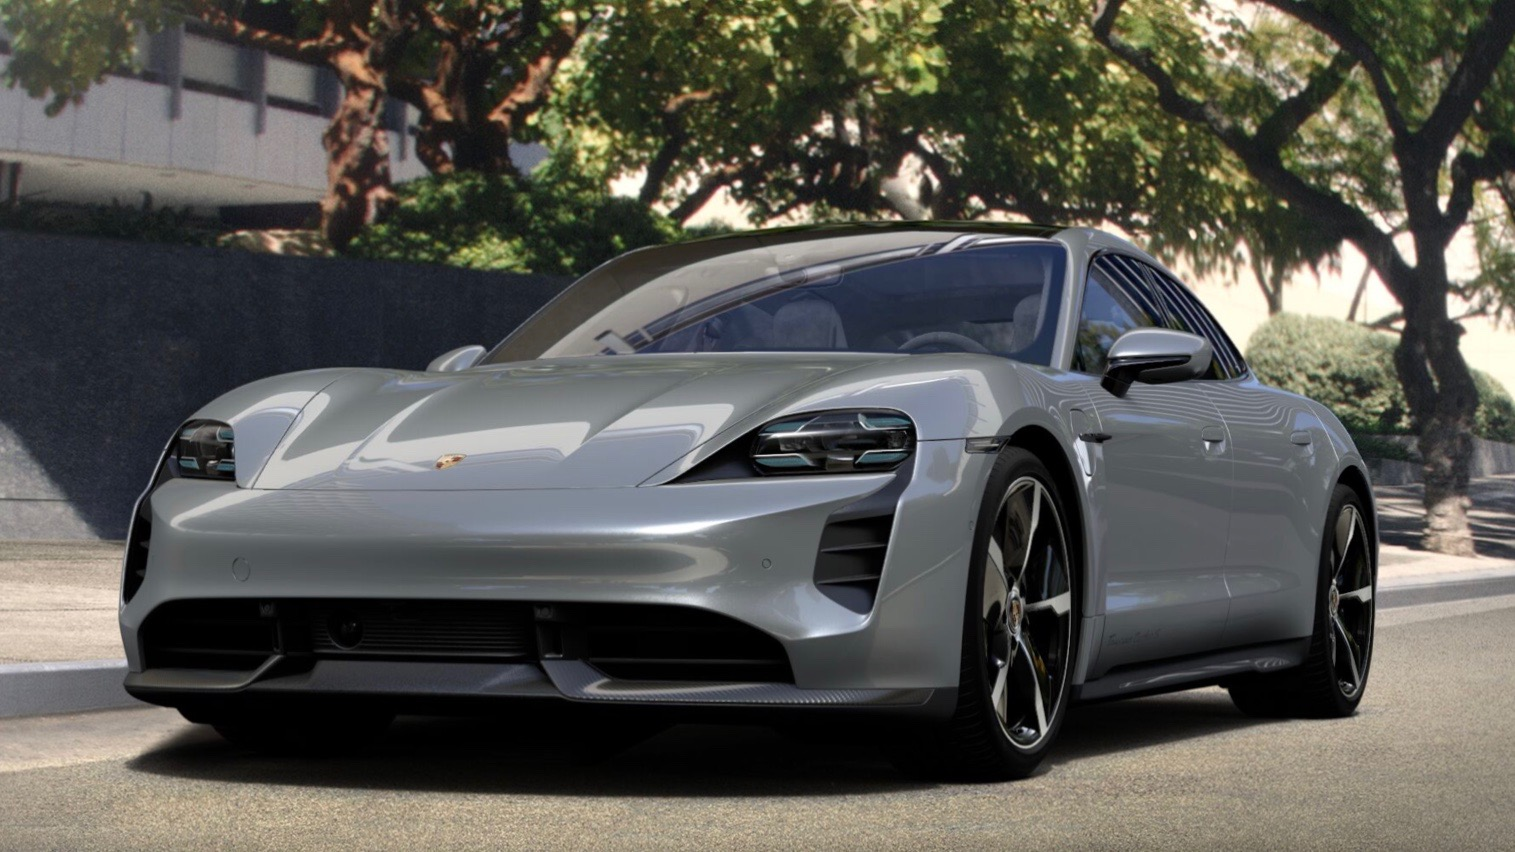 Mark Webber configura su Porsche Taycan